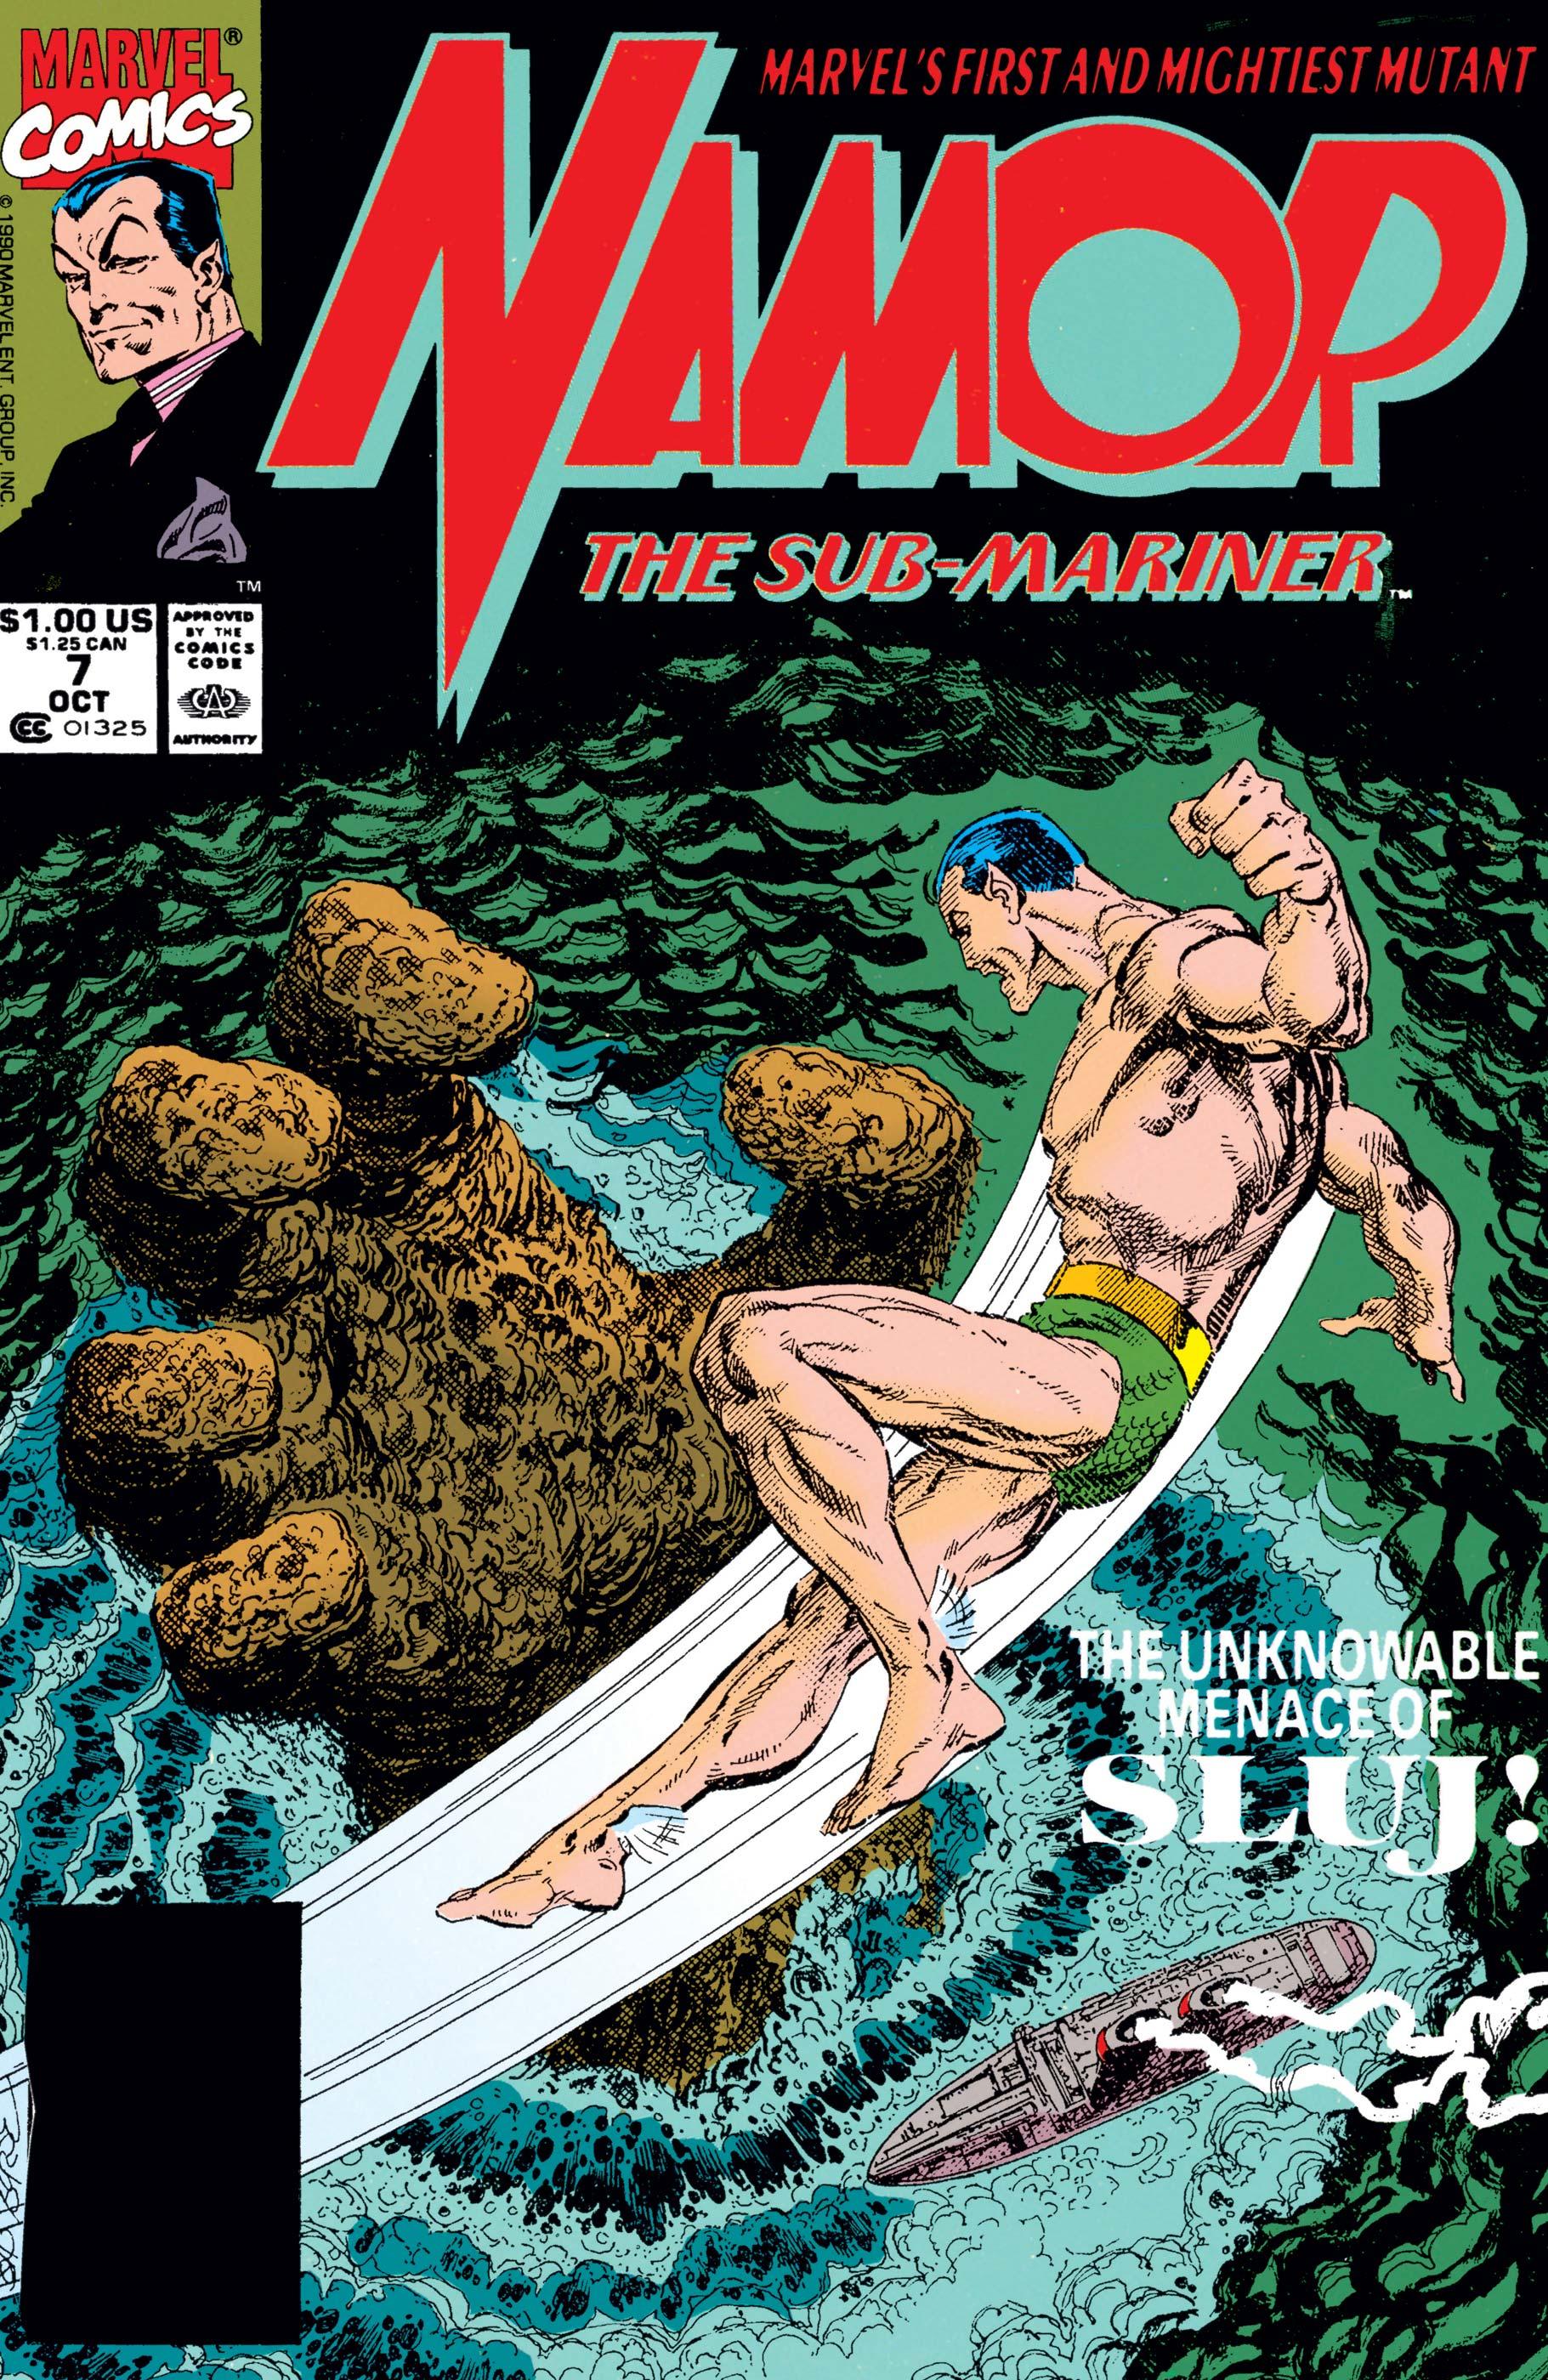 Namor: The Sub-Mariner (1990) #7